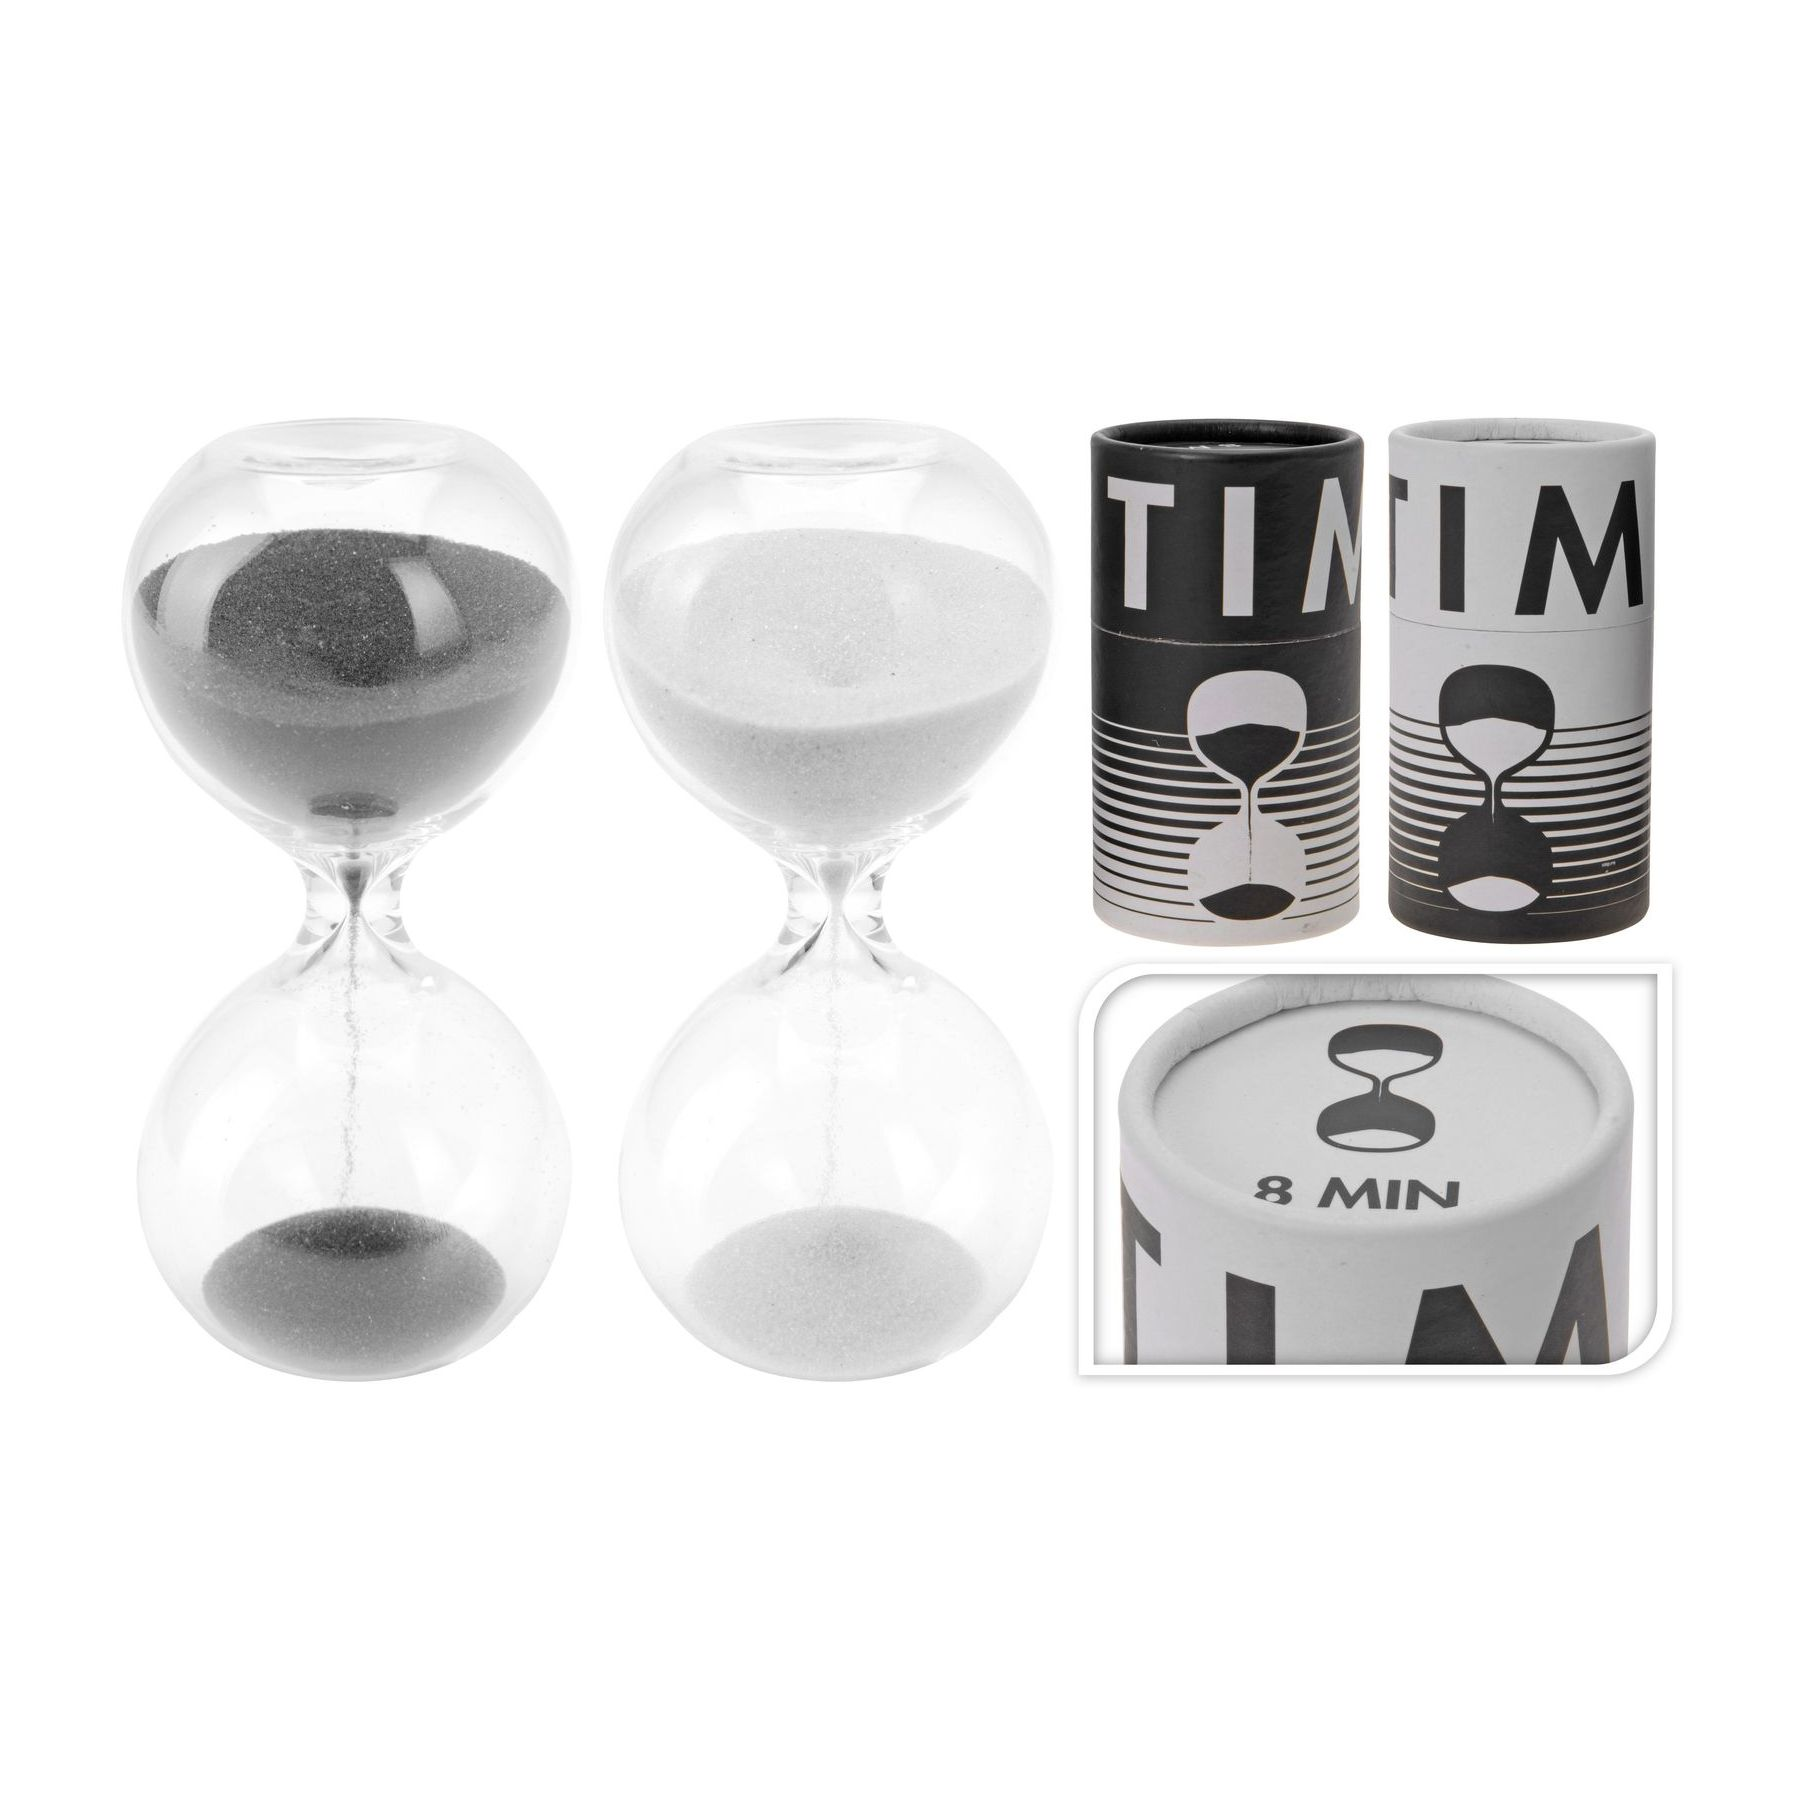 Часы песочные декоративные 4,5х9,5 на 8 мин.часы песочные декоративные, разм. 4,5х9,5 см, на 8 минут<br>